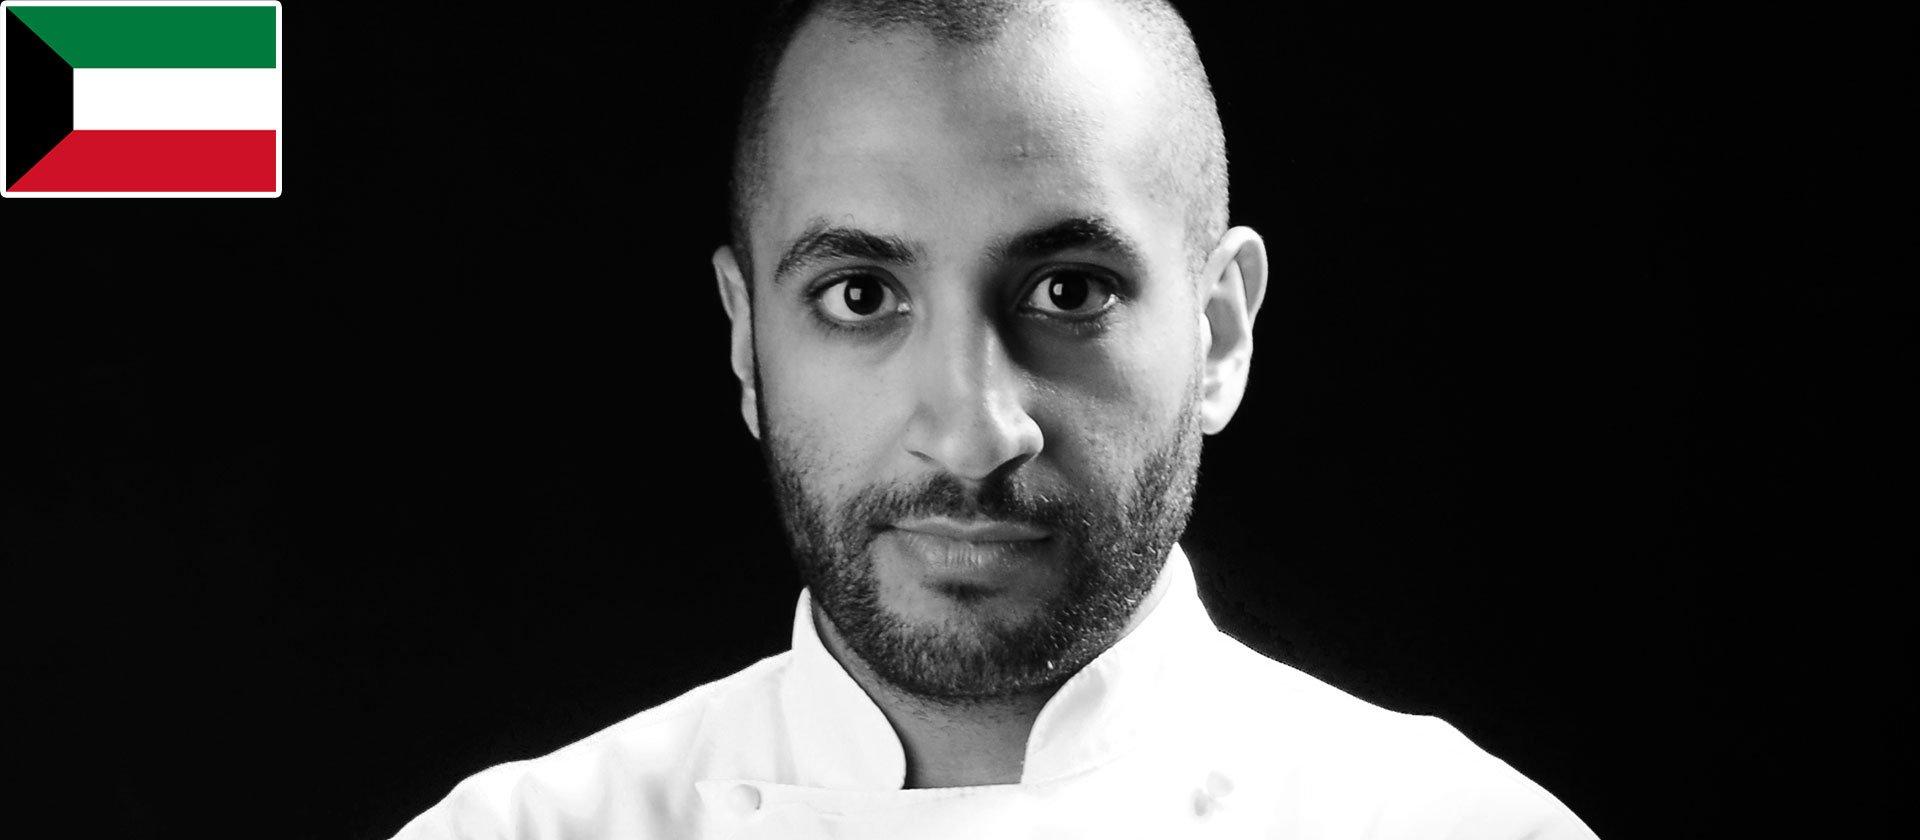 Faisal Al Nashmi